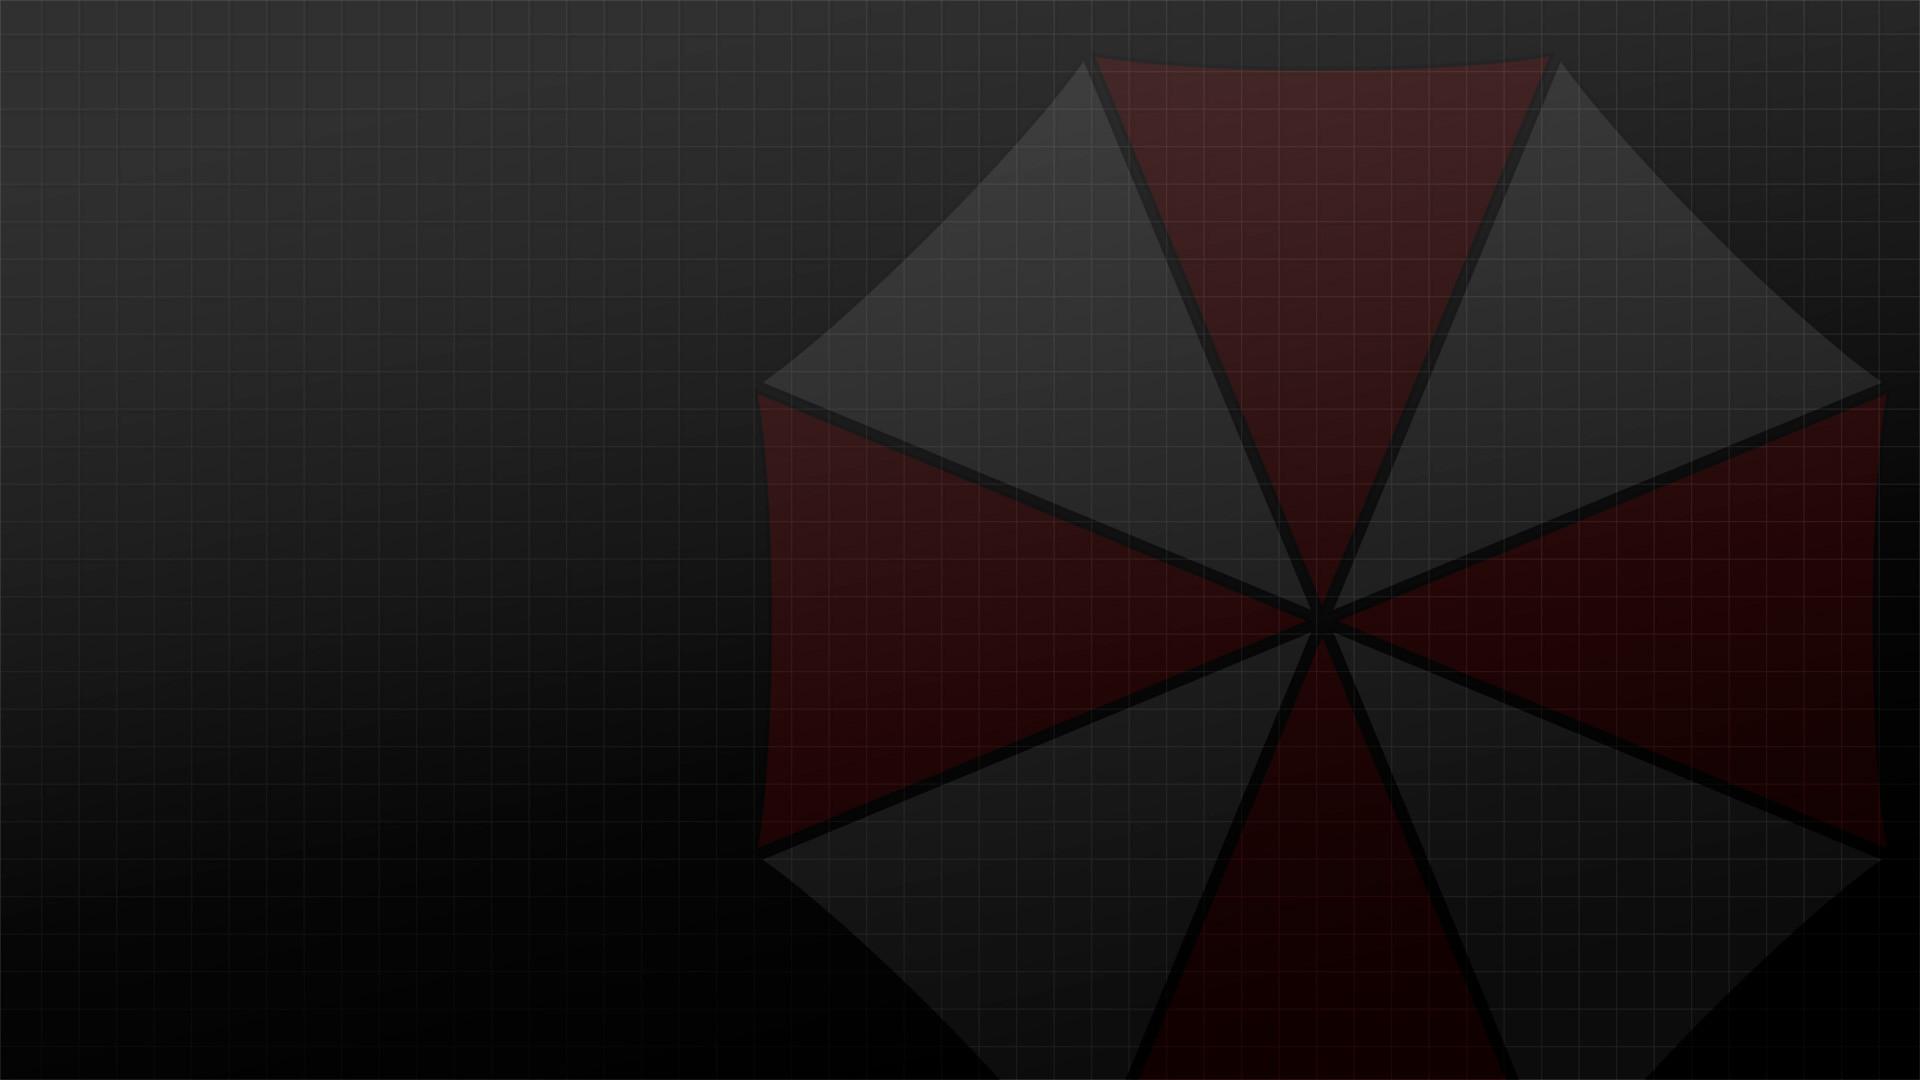 umbrella corporation wallpaper background 8262